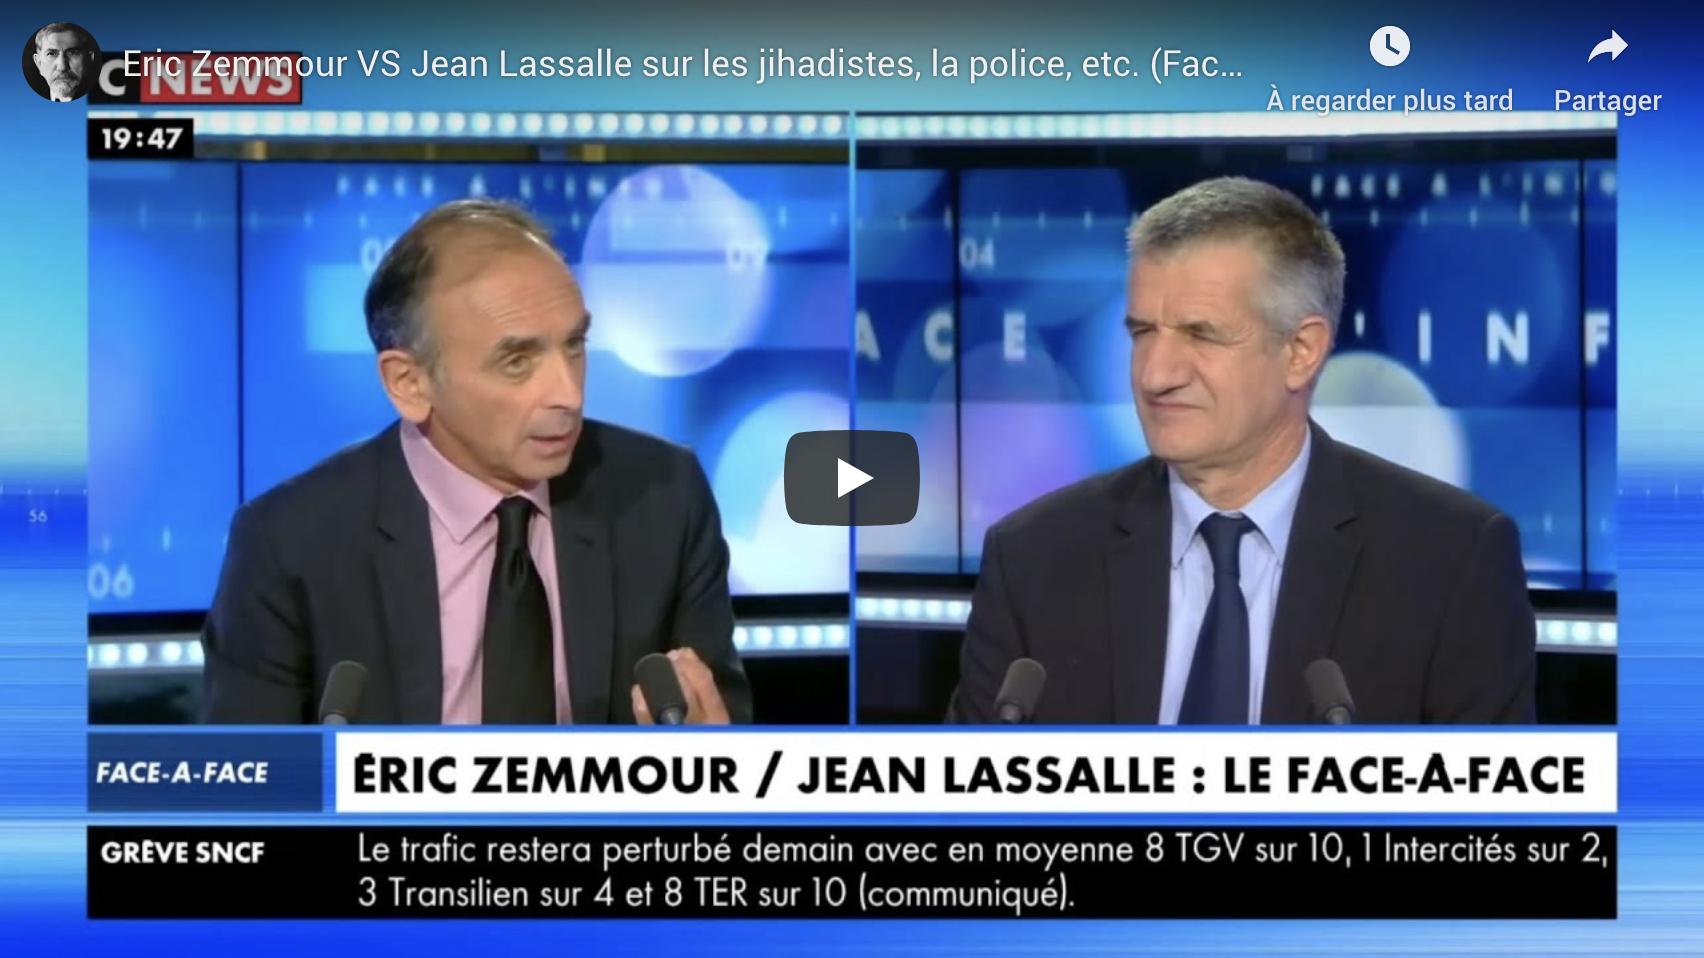 Djihadisme, police, etc. : Éric Zemmour VS Jean Lassalle (DÉBAT)